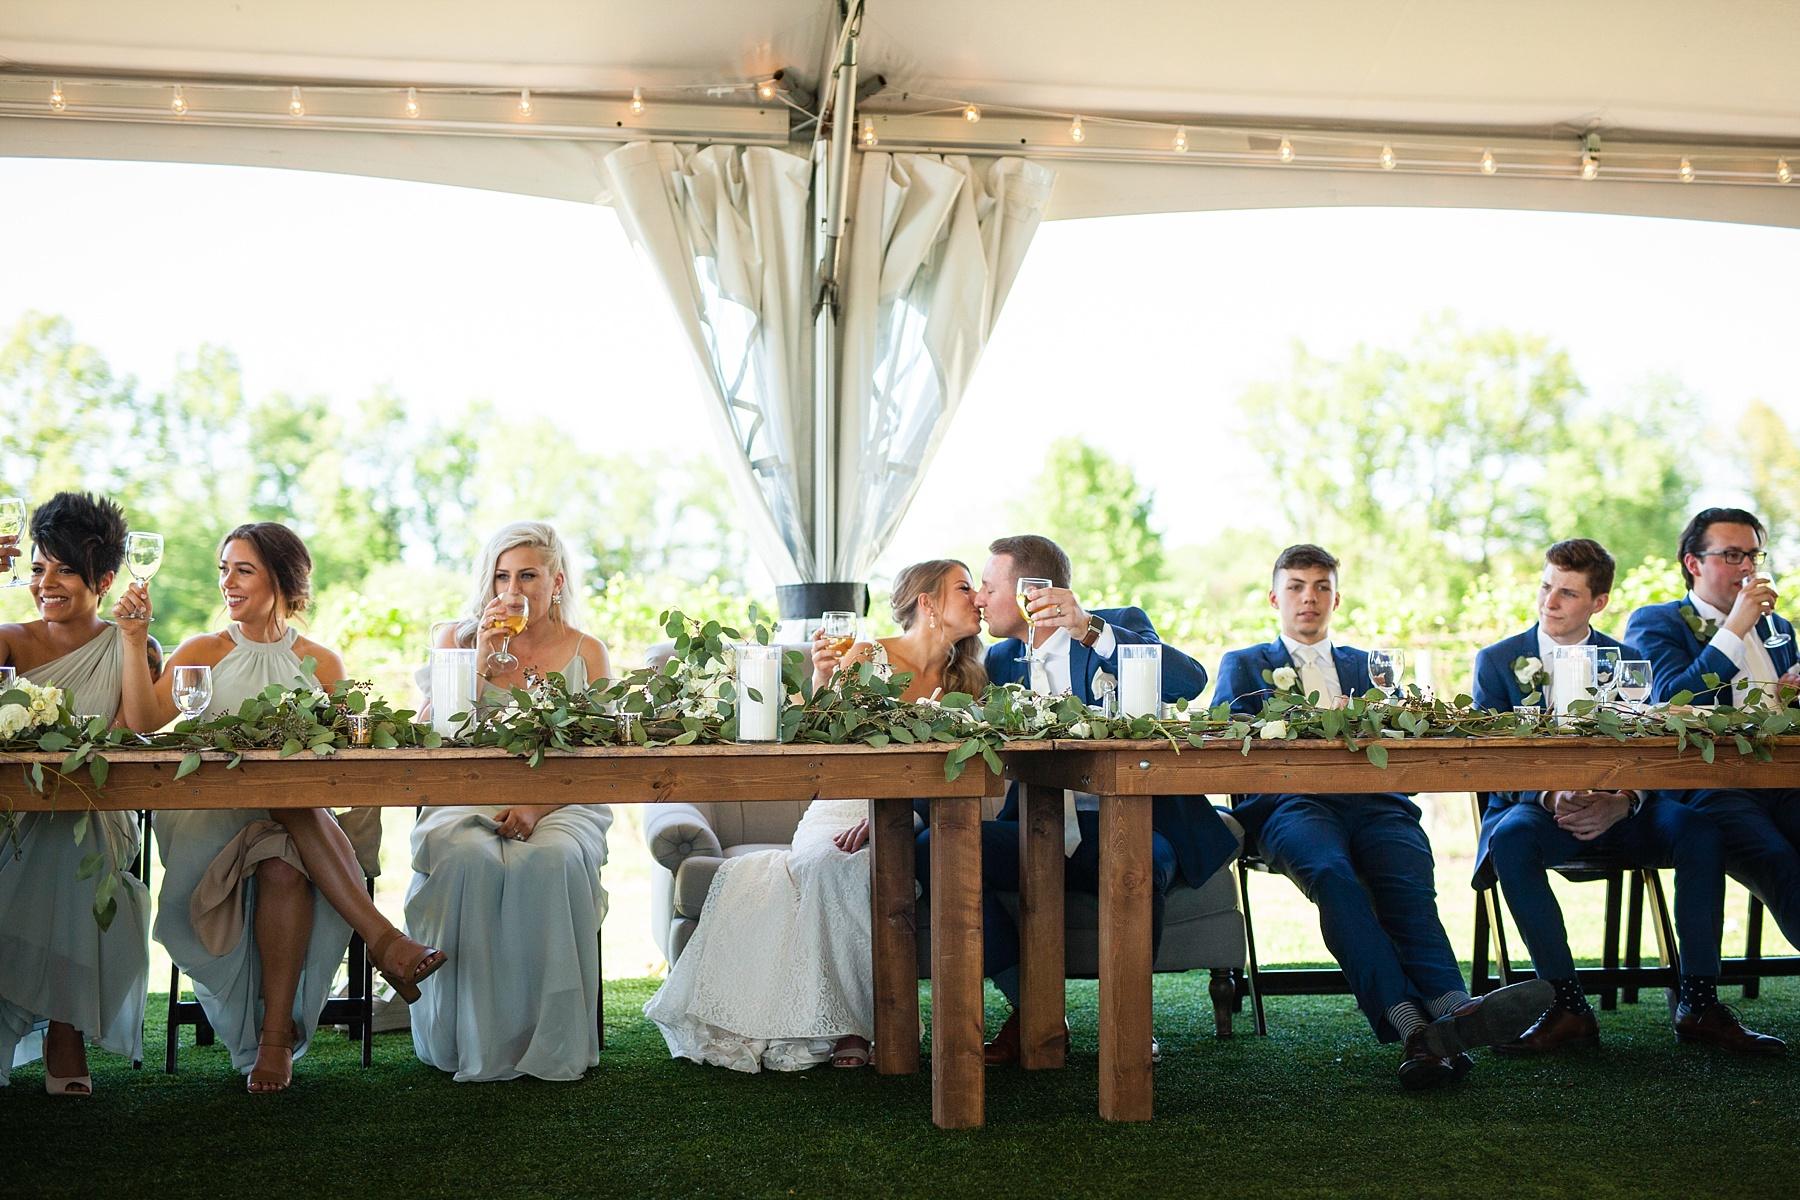 Brandon_Shafer_Photography_Kara_Doug_12_corners_Wedding_Benton_Harbor_0060.jpg